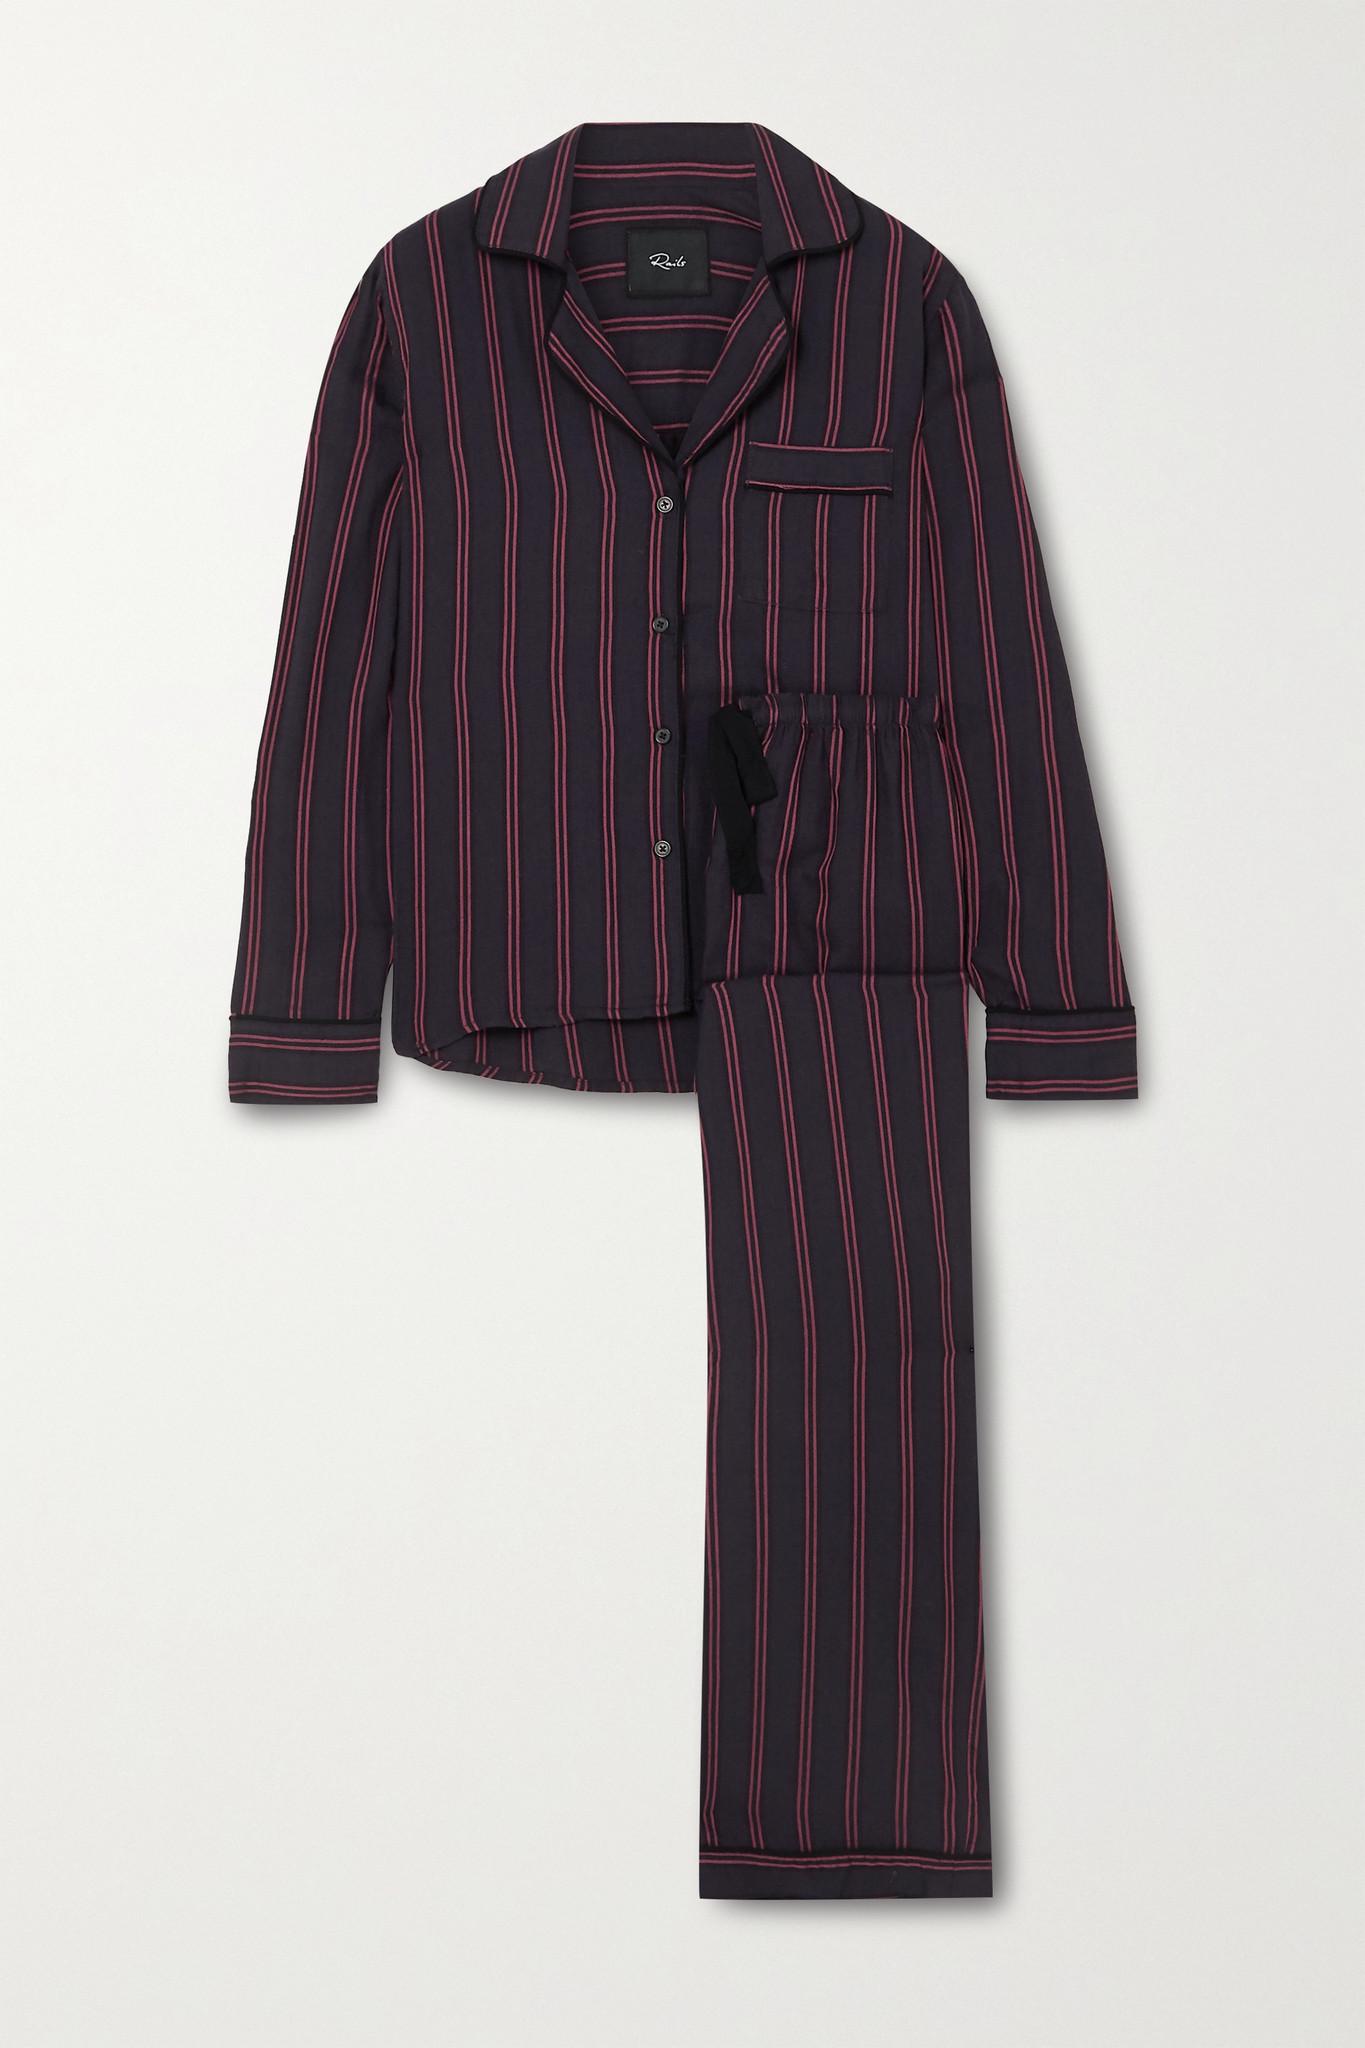 RAILS - Clara 条纹巴里纱睡衣套装 - 蓝色 - medium